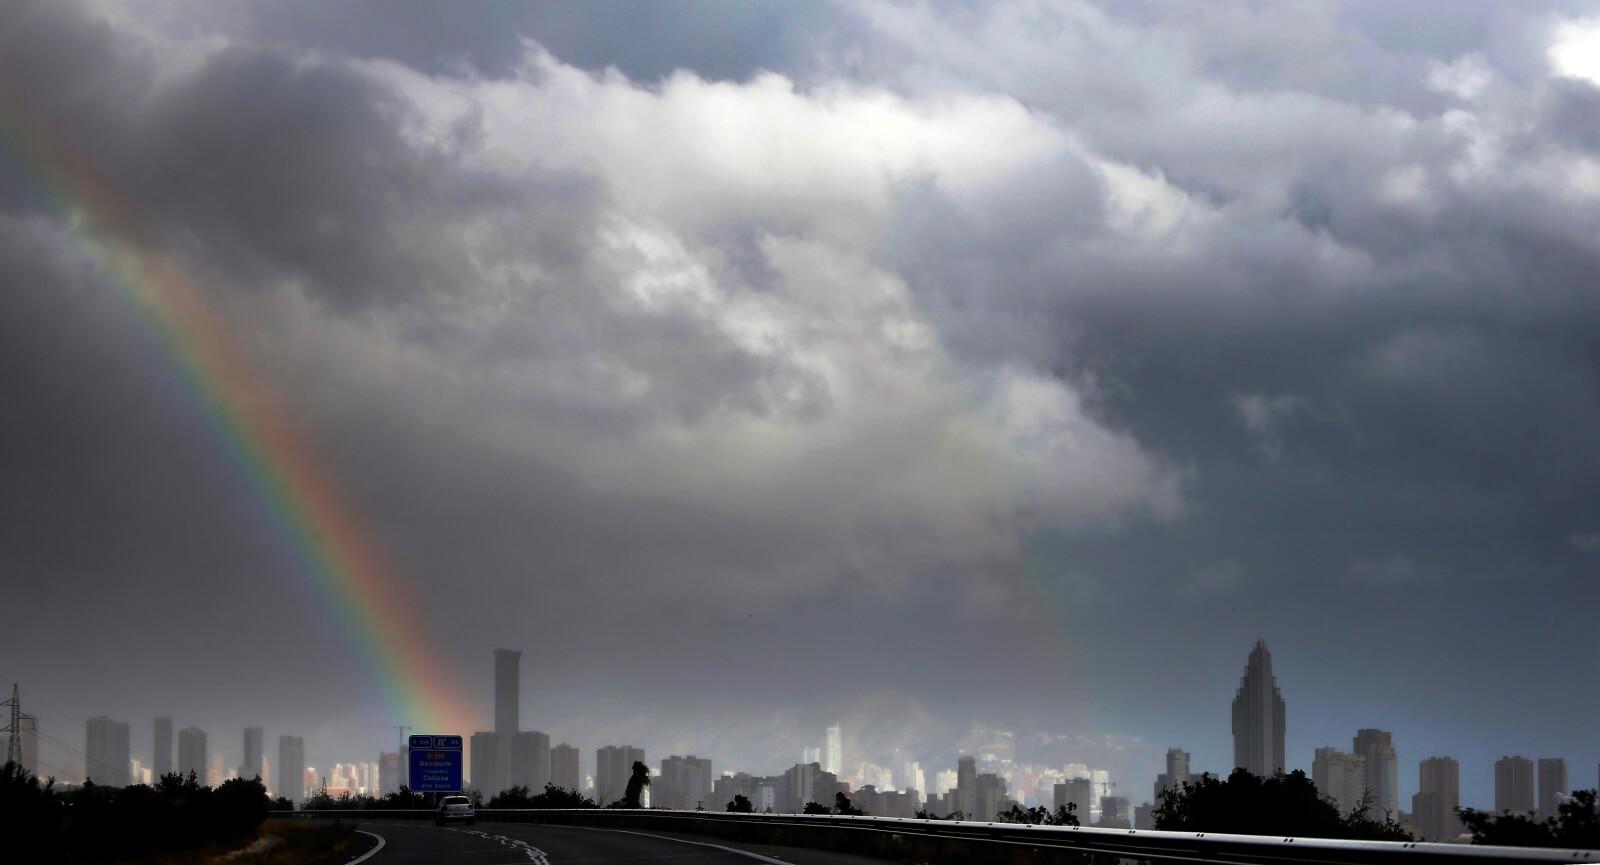 Pogoda w Hiszpanii fot. EPA/Manuel Lorenzo